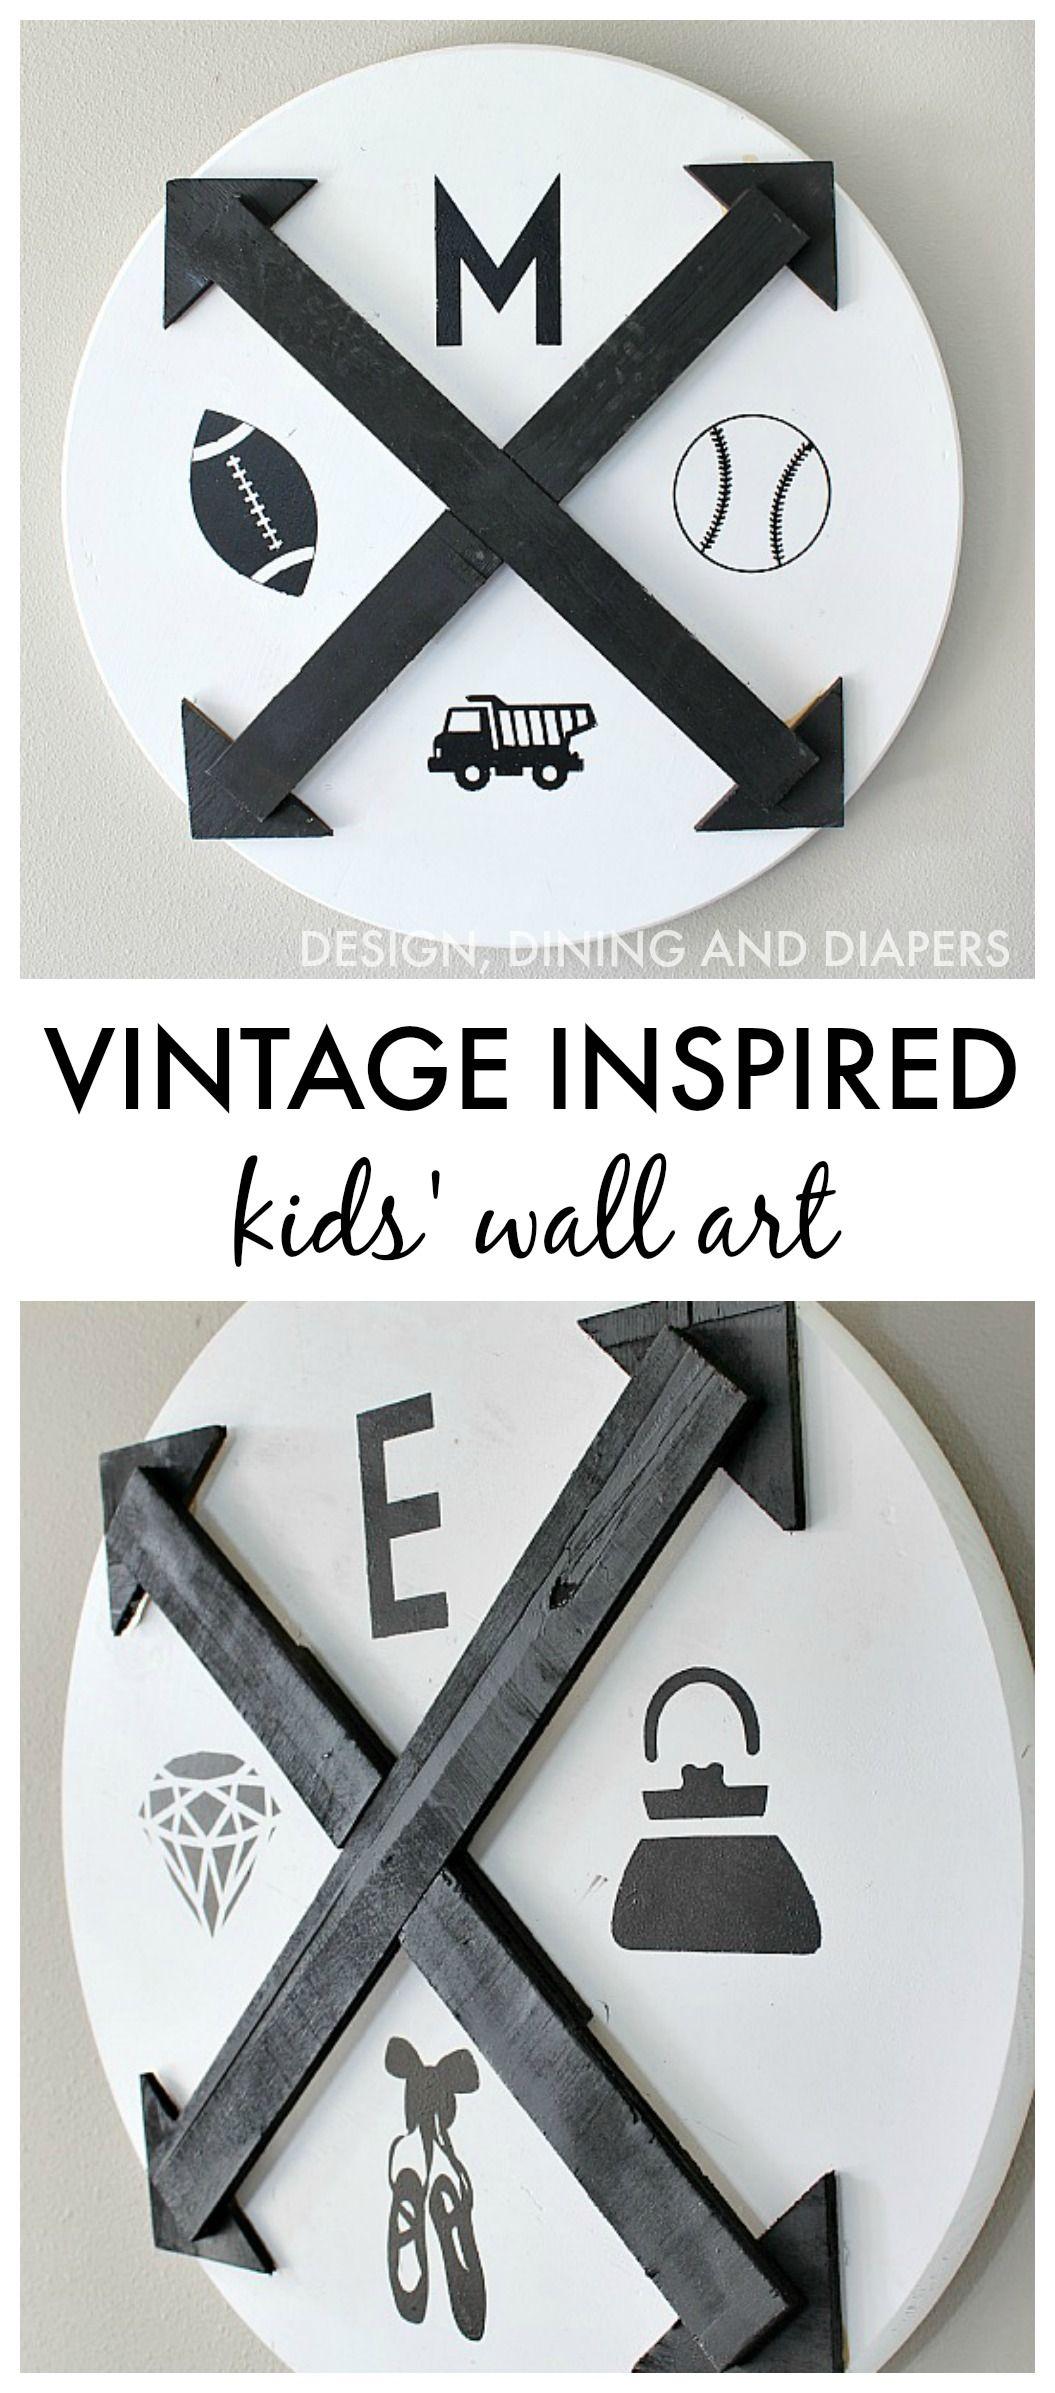 DIY Vintage Inspired Wall Art For Kids + Giveaway   Kids ...